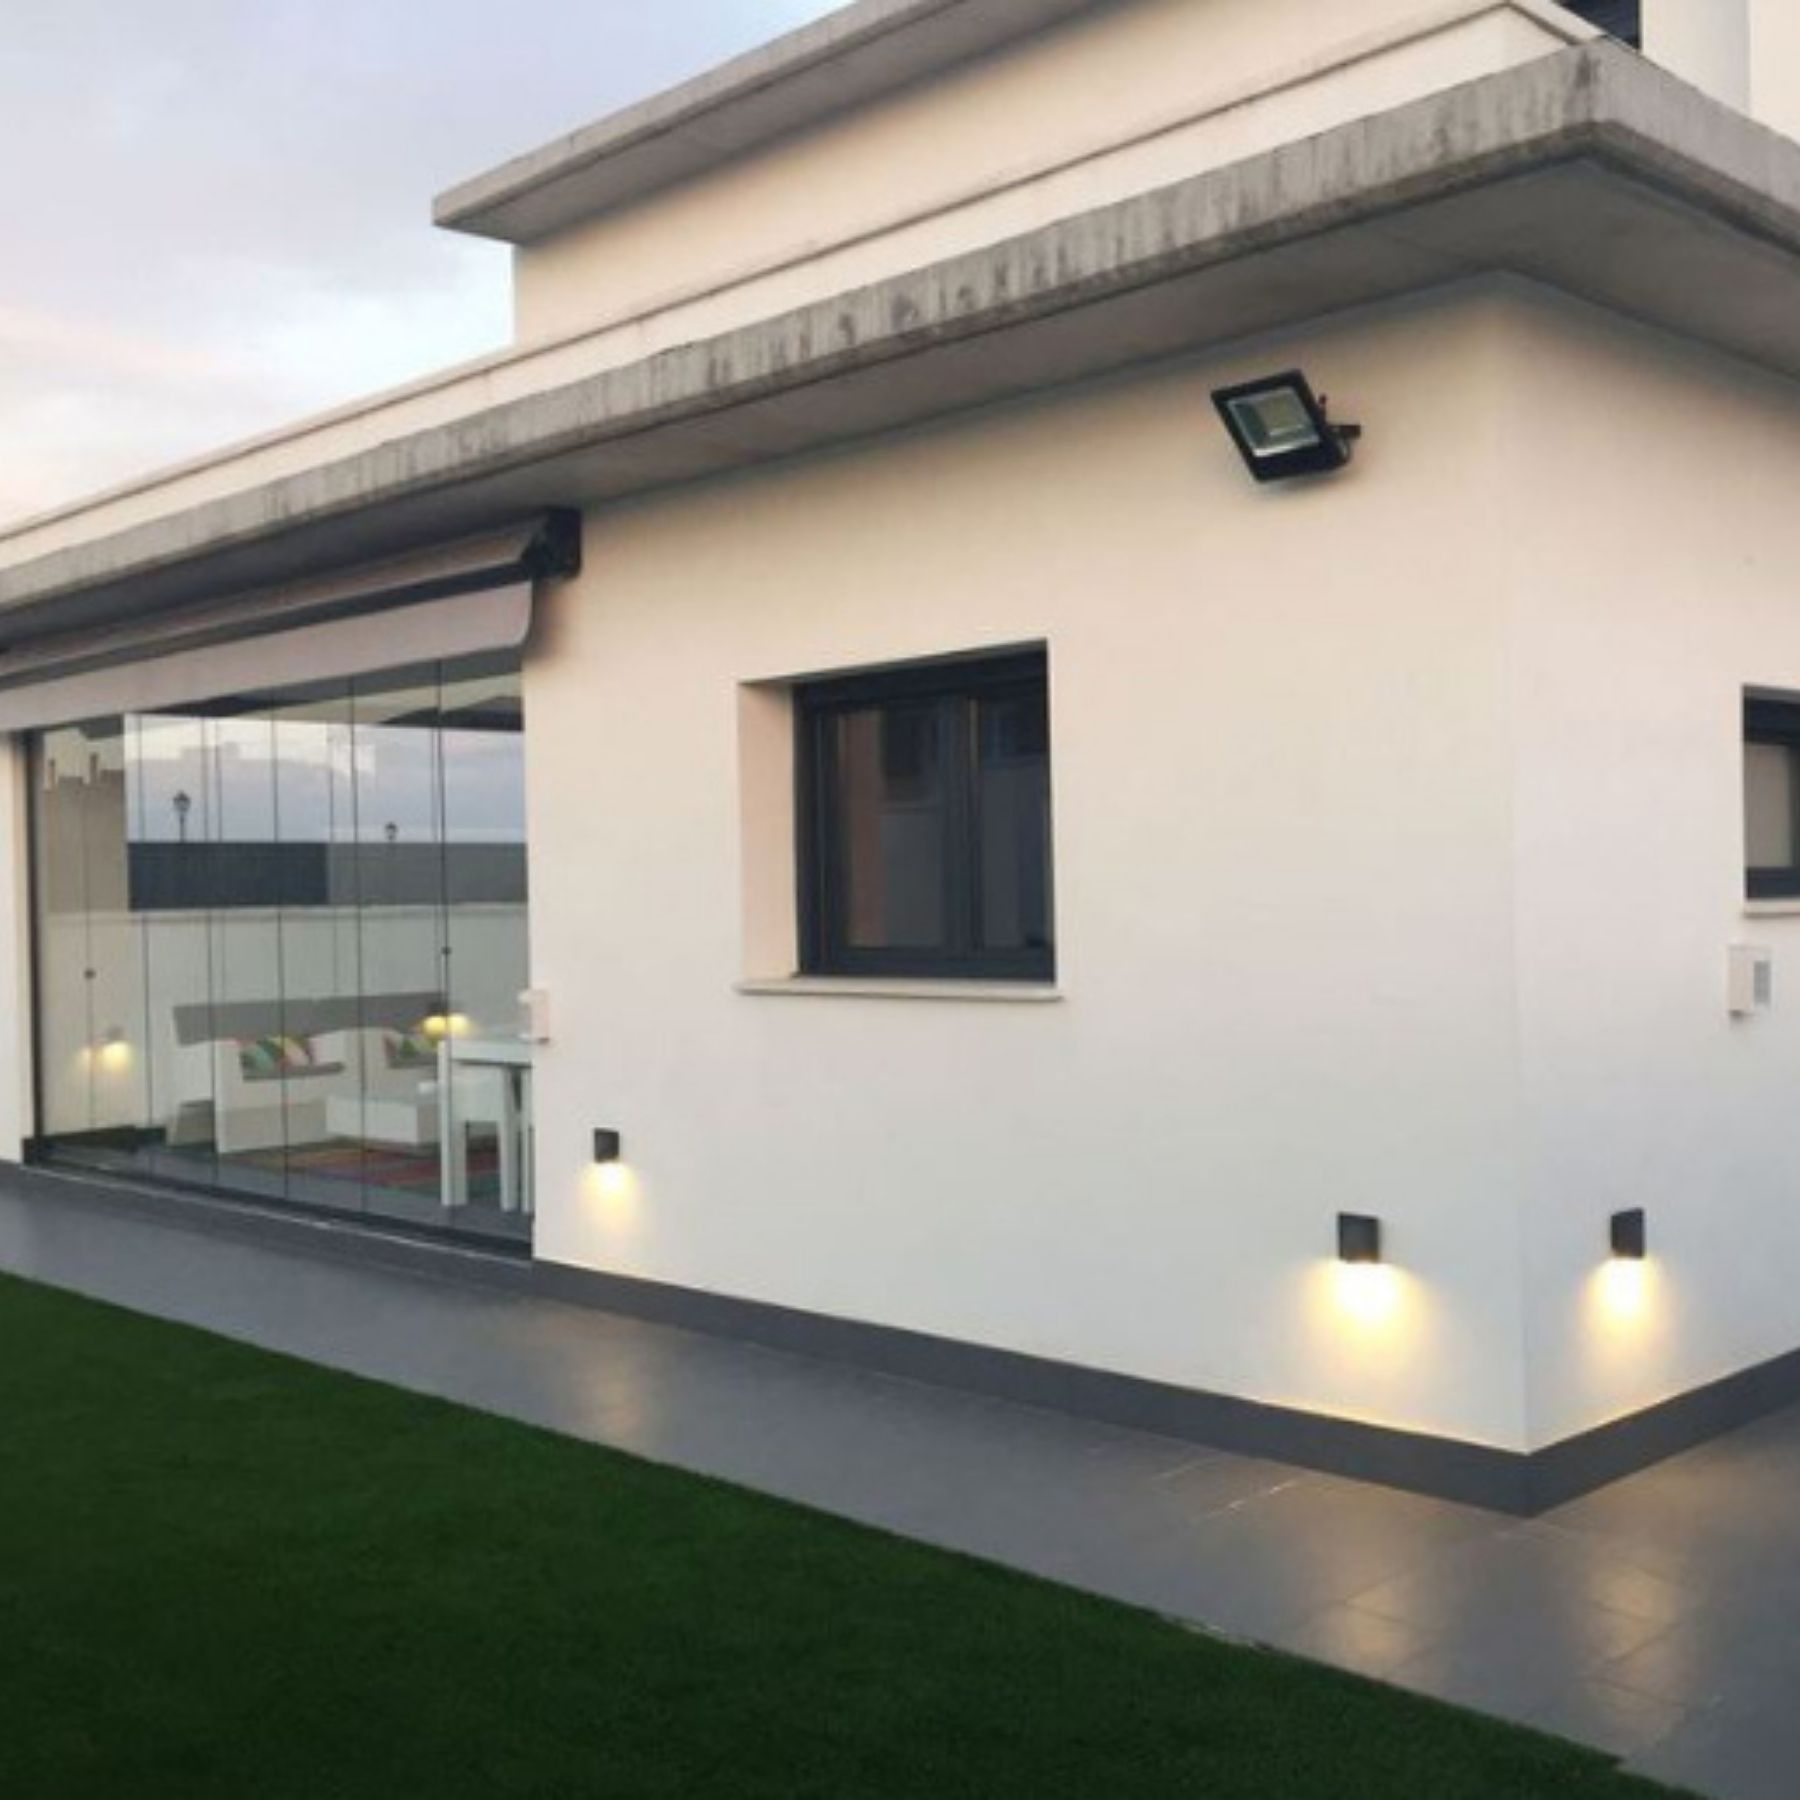 iluminación jardín piscina led solar pared